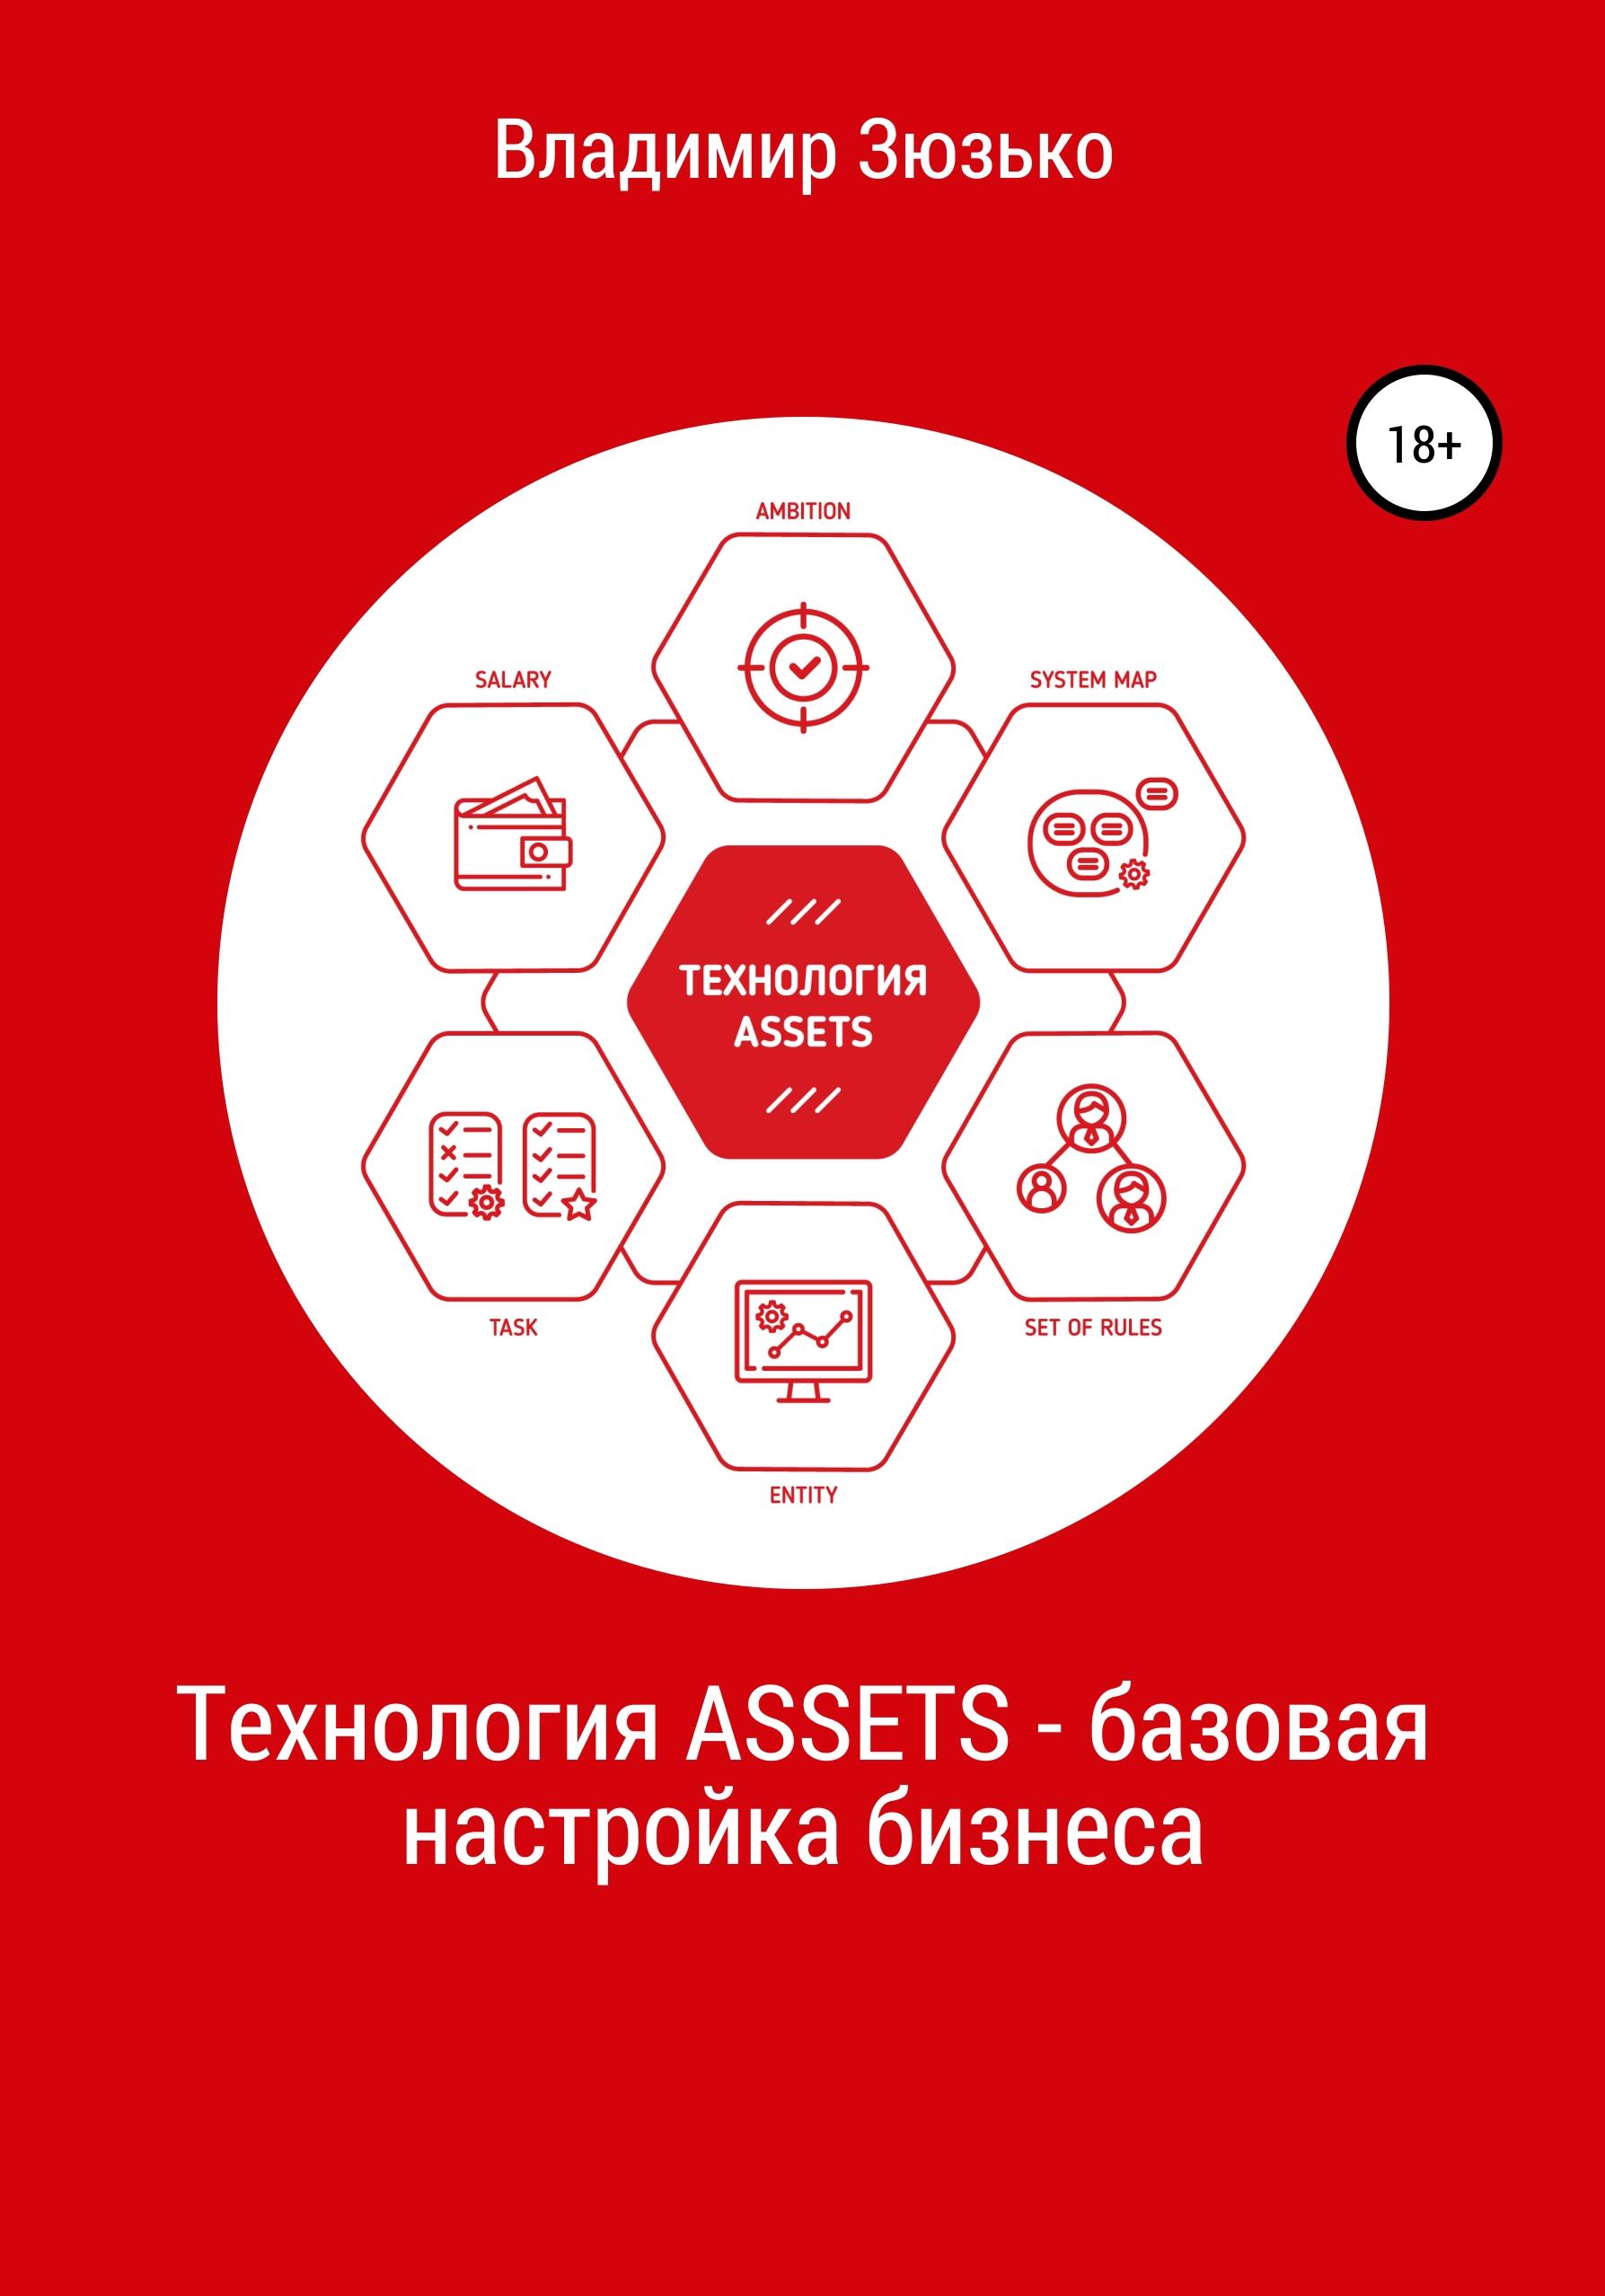 Технология ASSETS – базовая настройка бизнеса